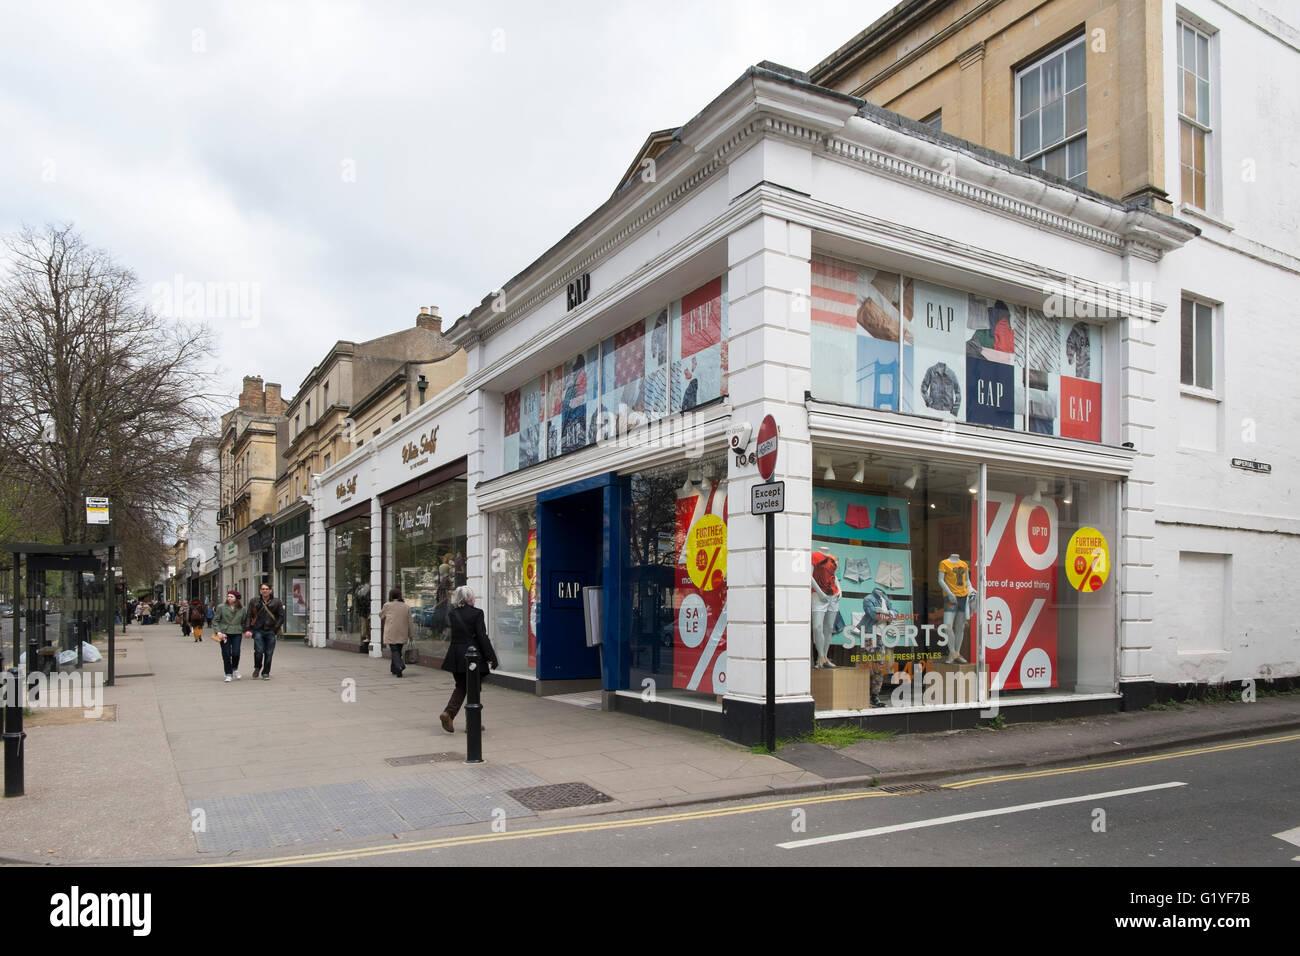 Gap clothes shop on the Promenade in Cheltenham, Gloucestershire, UK - Stock Image